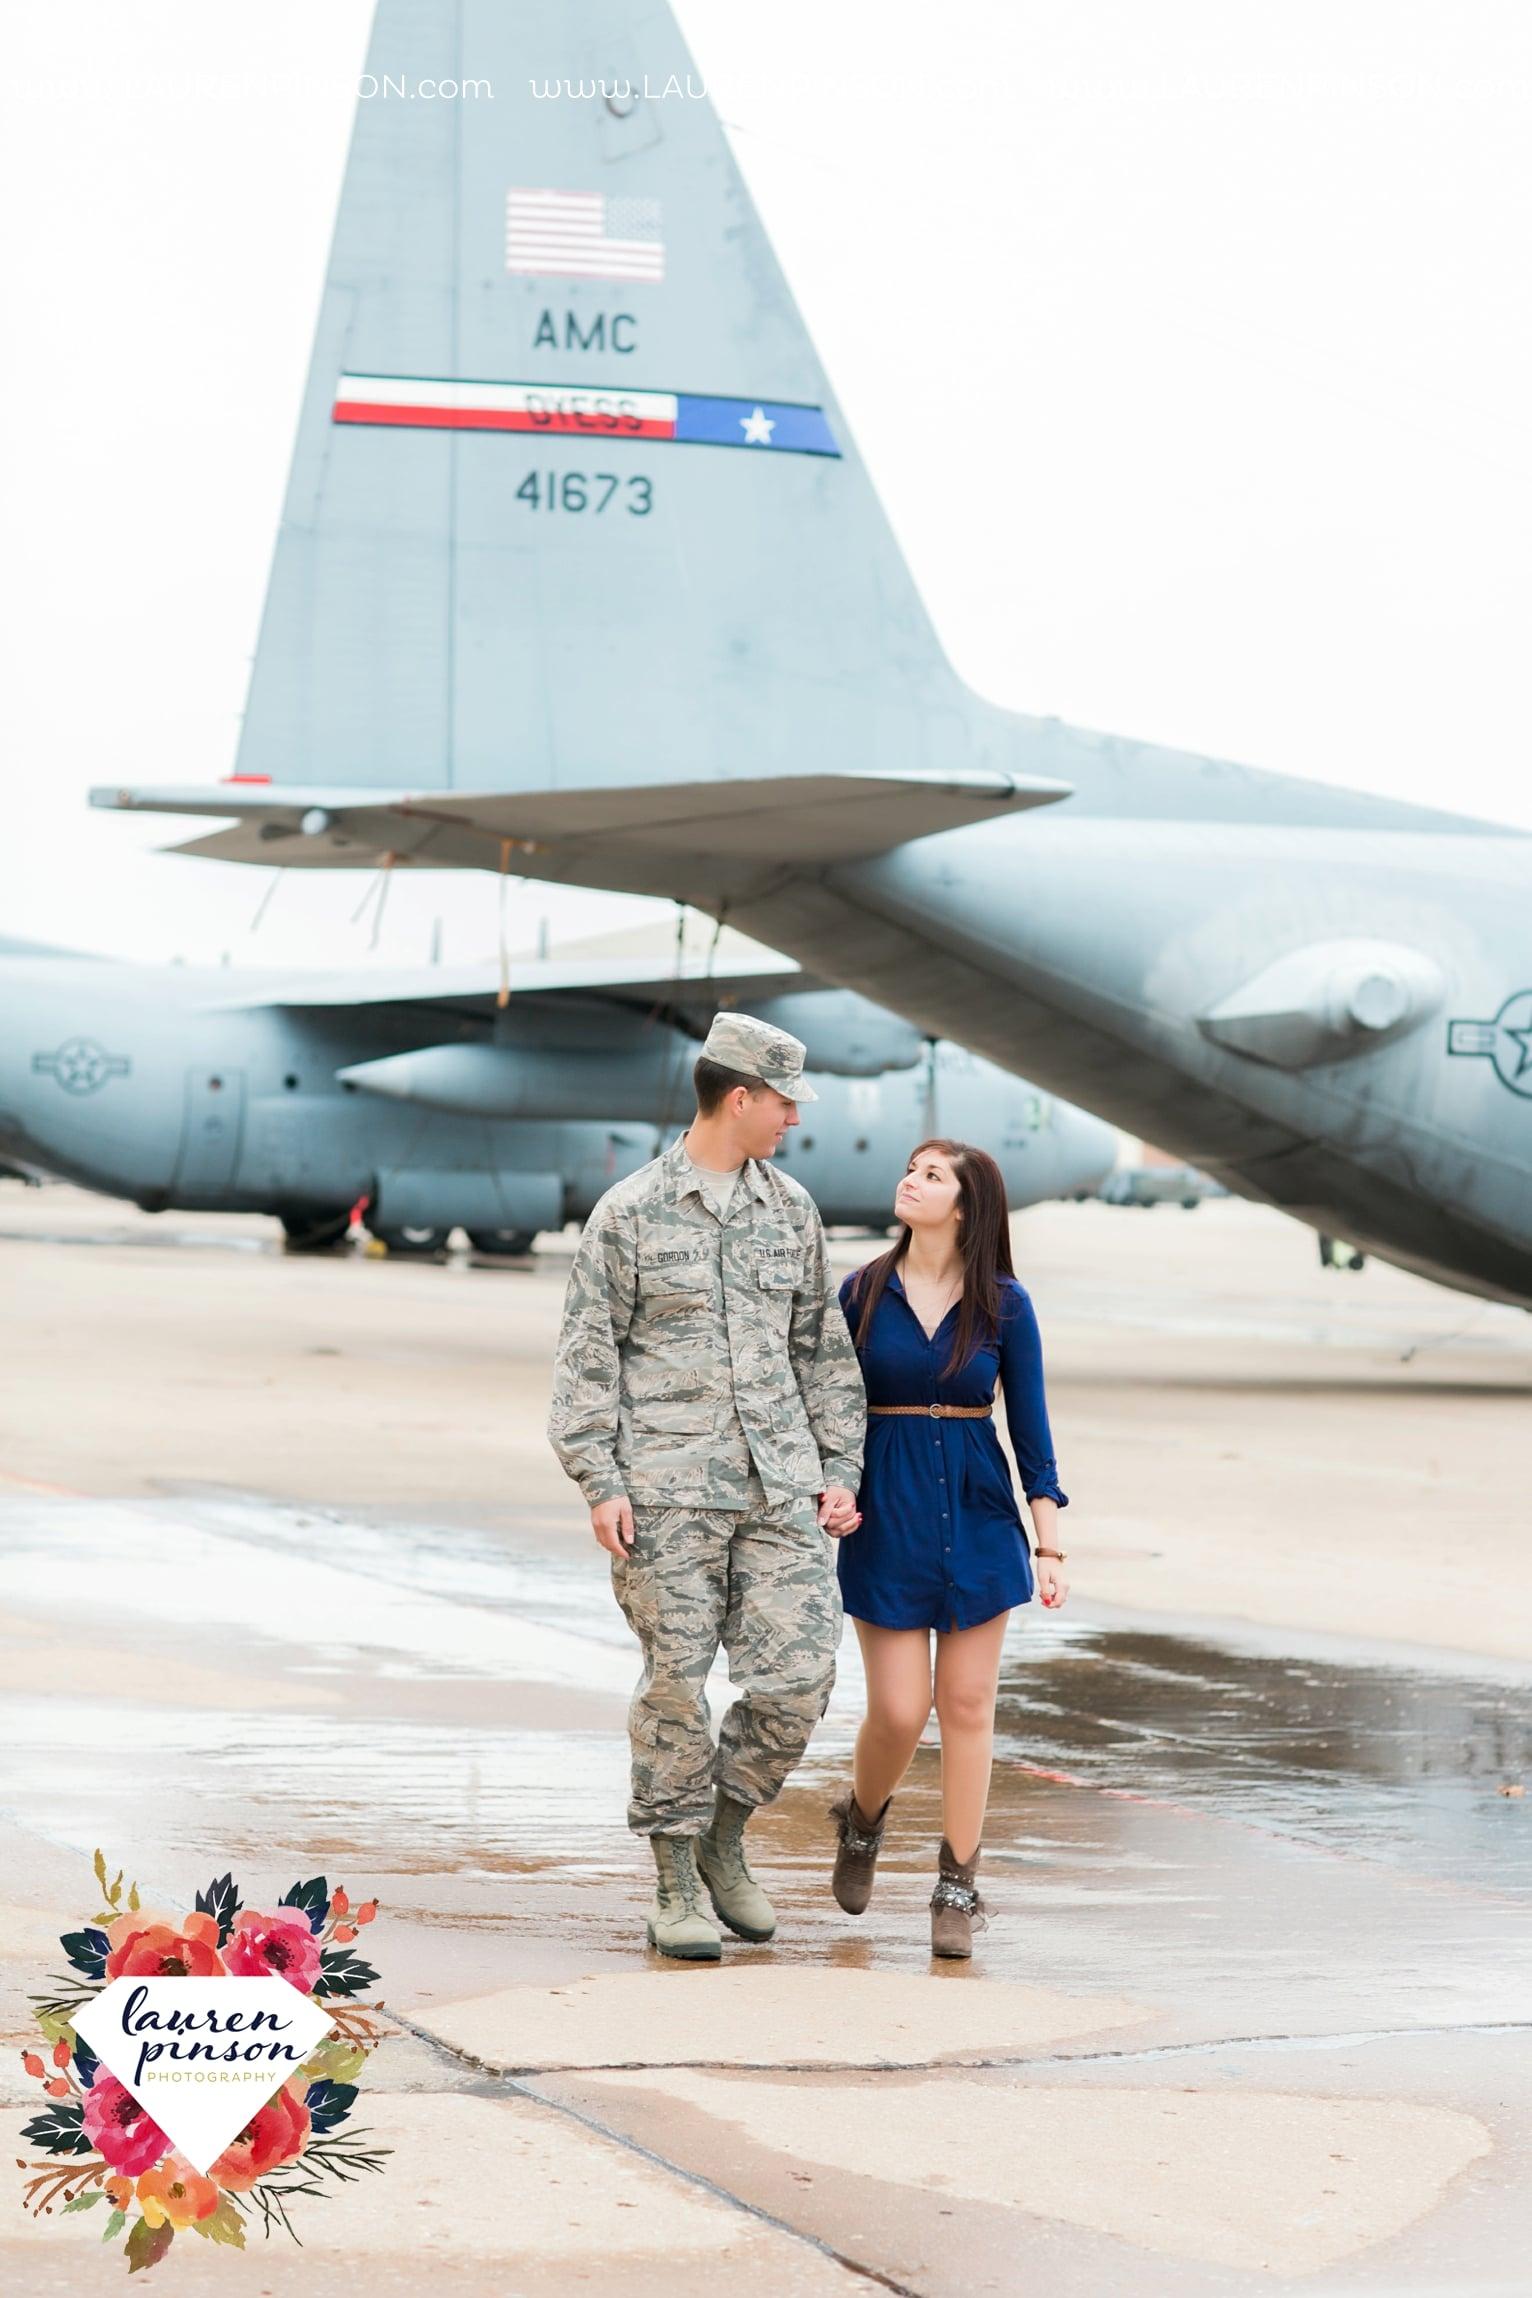 sheppard-afb-wichita-falls-engagement-session-airmen-in-uniform-abu-airplanes-bride-engagement-ring-texas-air-force-base_2003.jpg